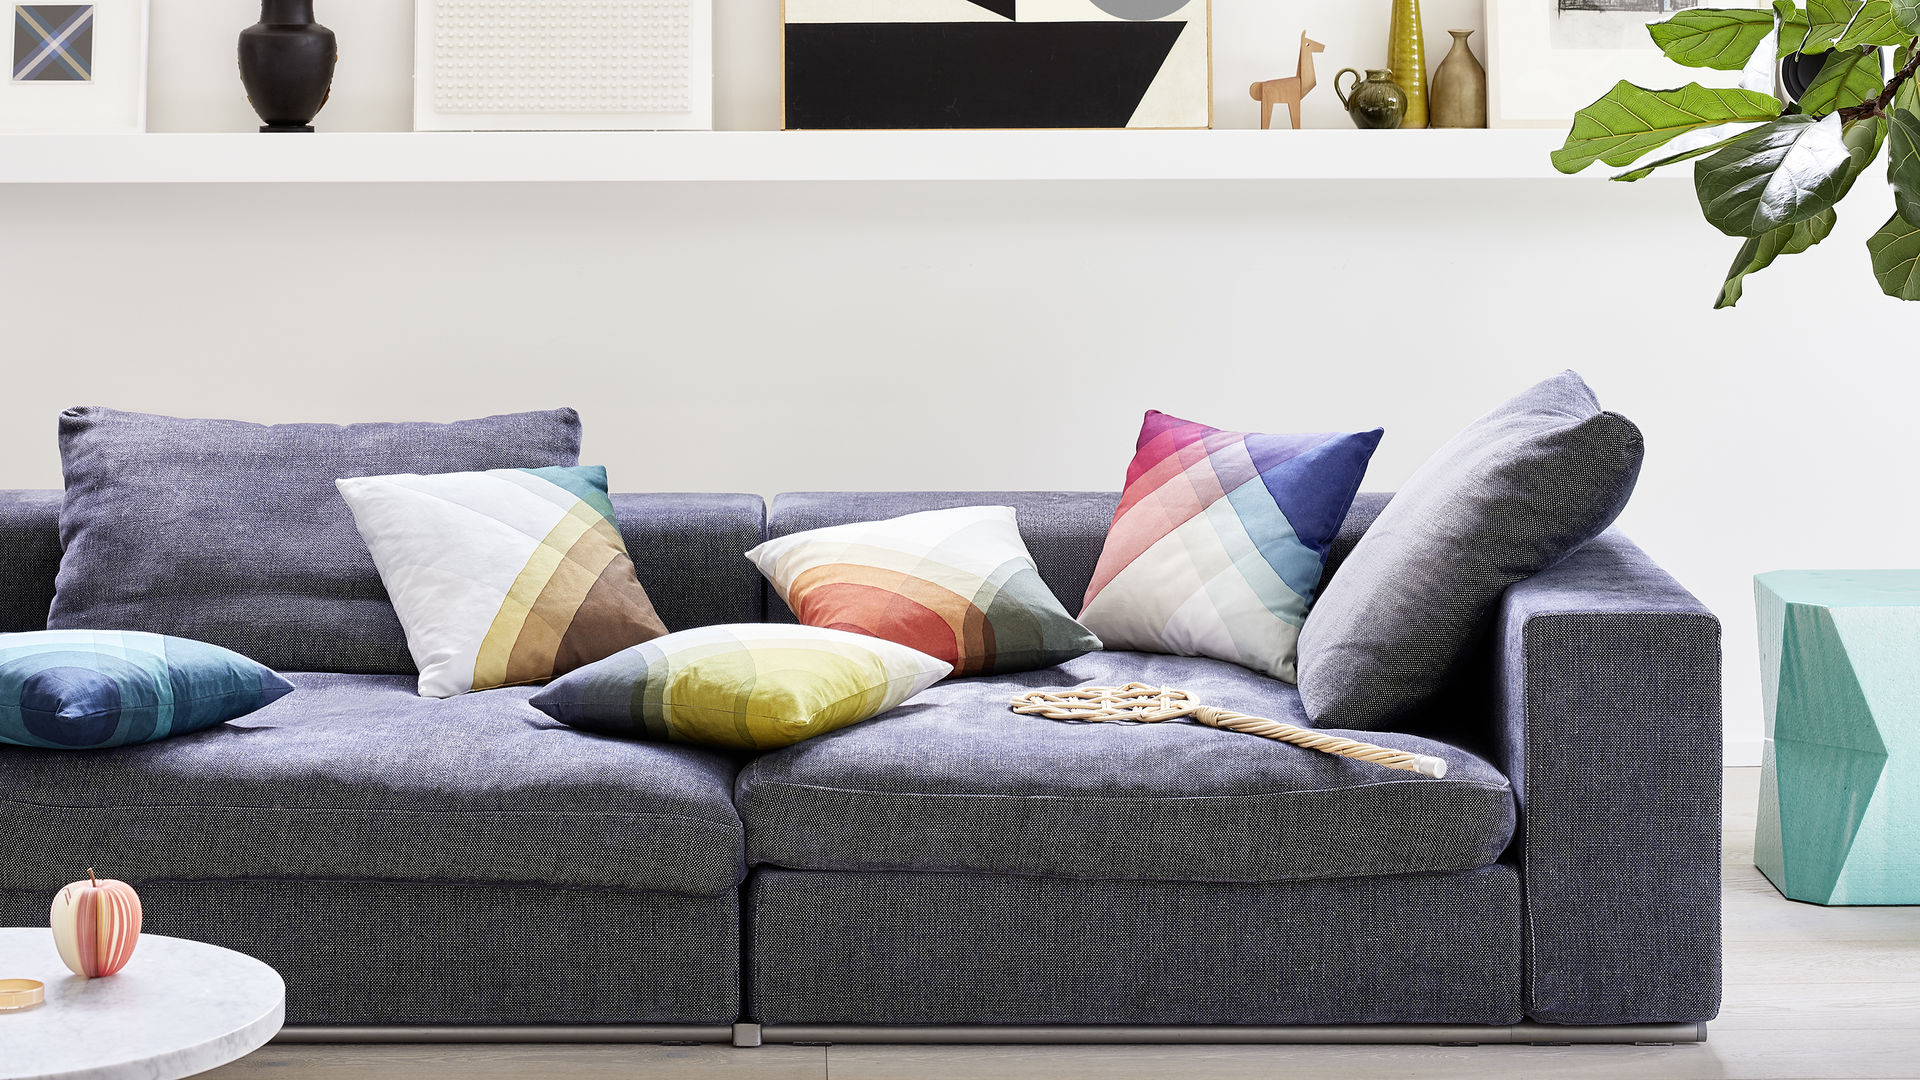 Herringbone Pillows_web_16-9